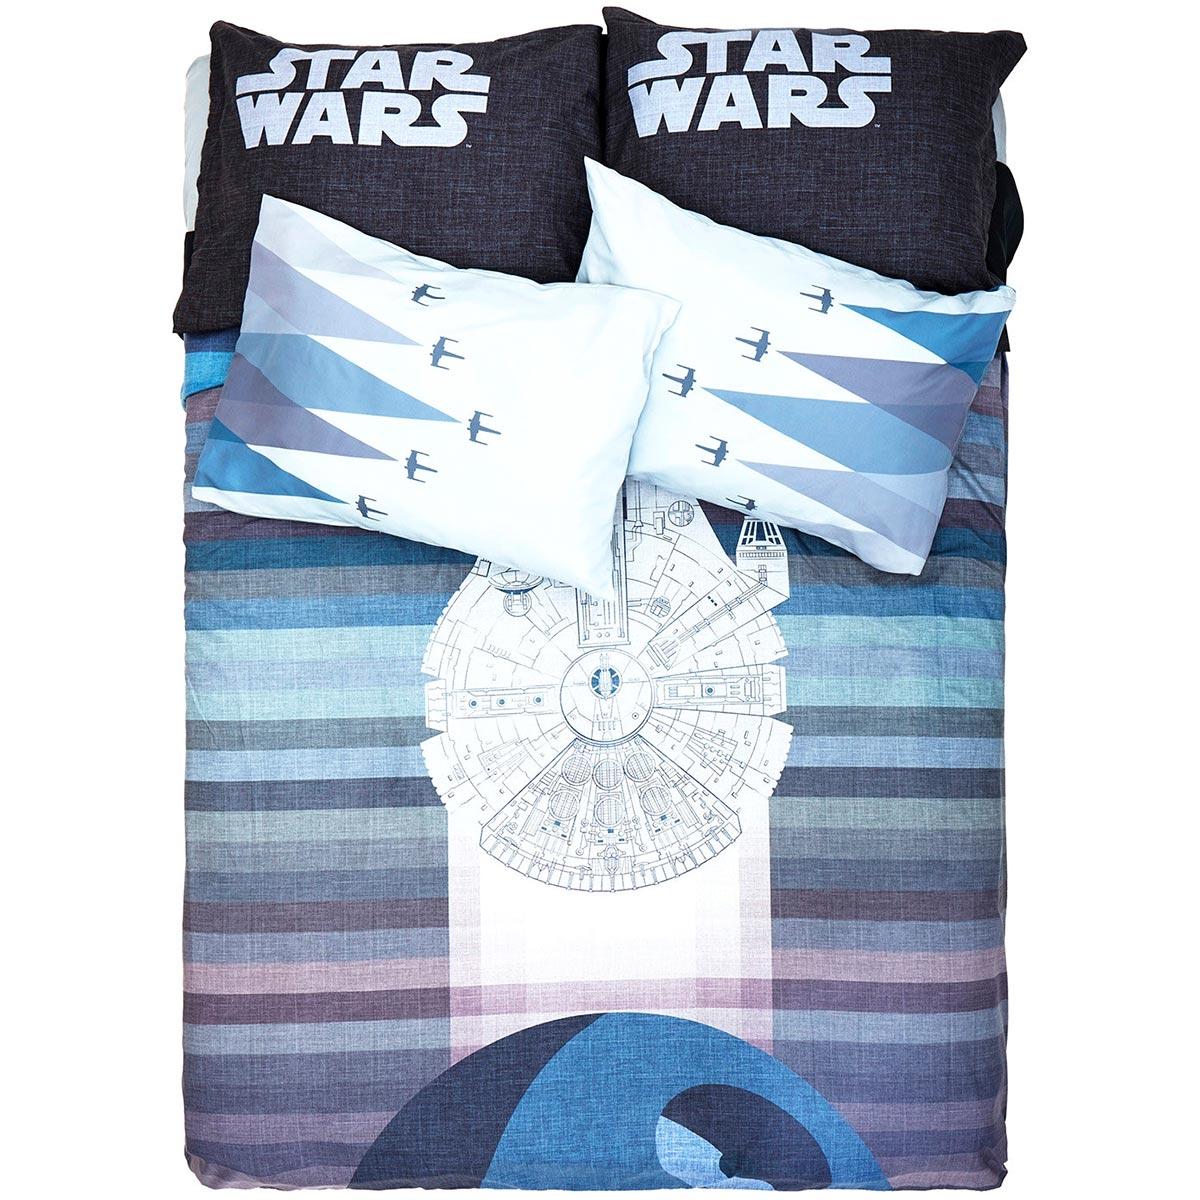 Millennium Falcon Duvet Cover & X-Wing Pillowcases